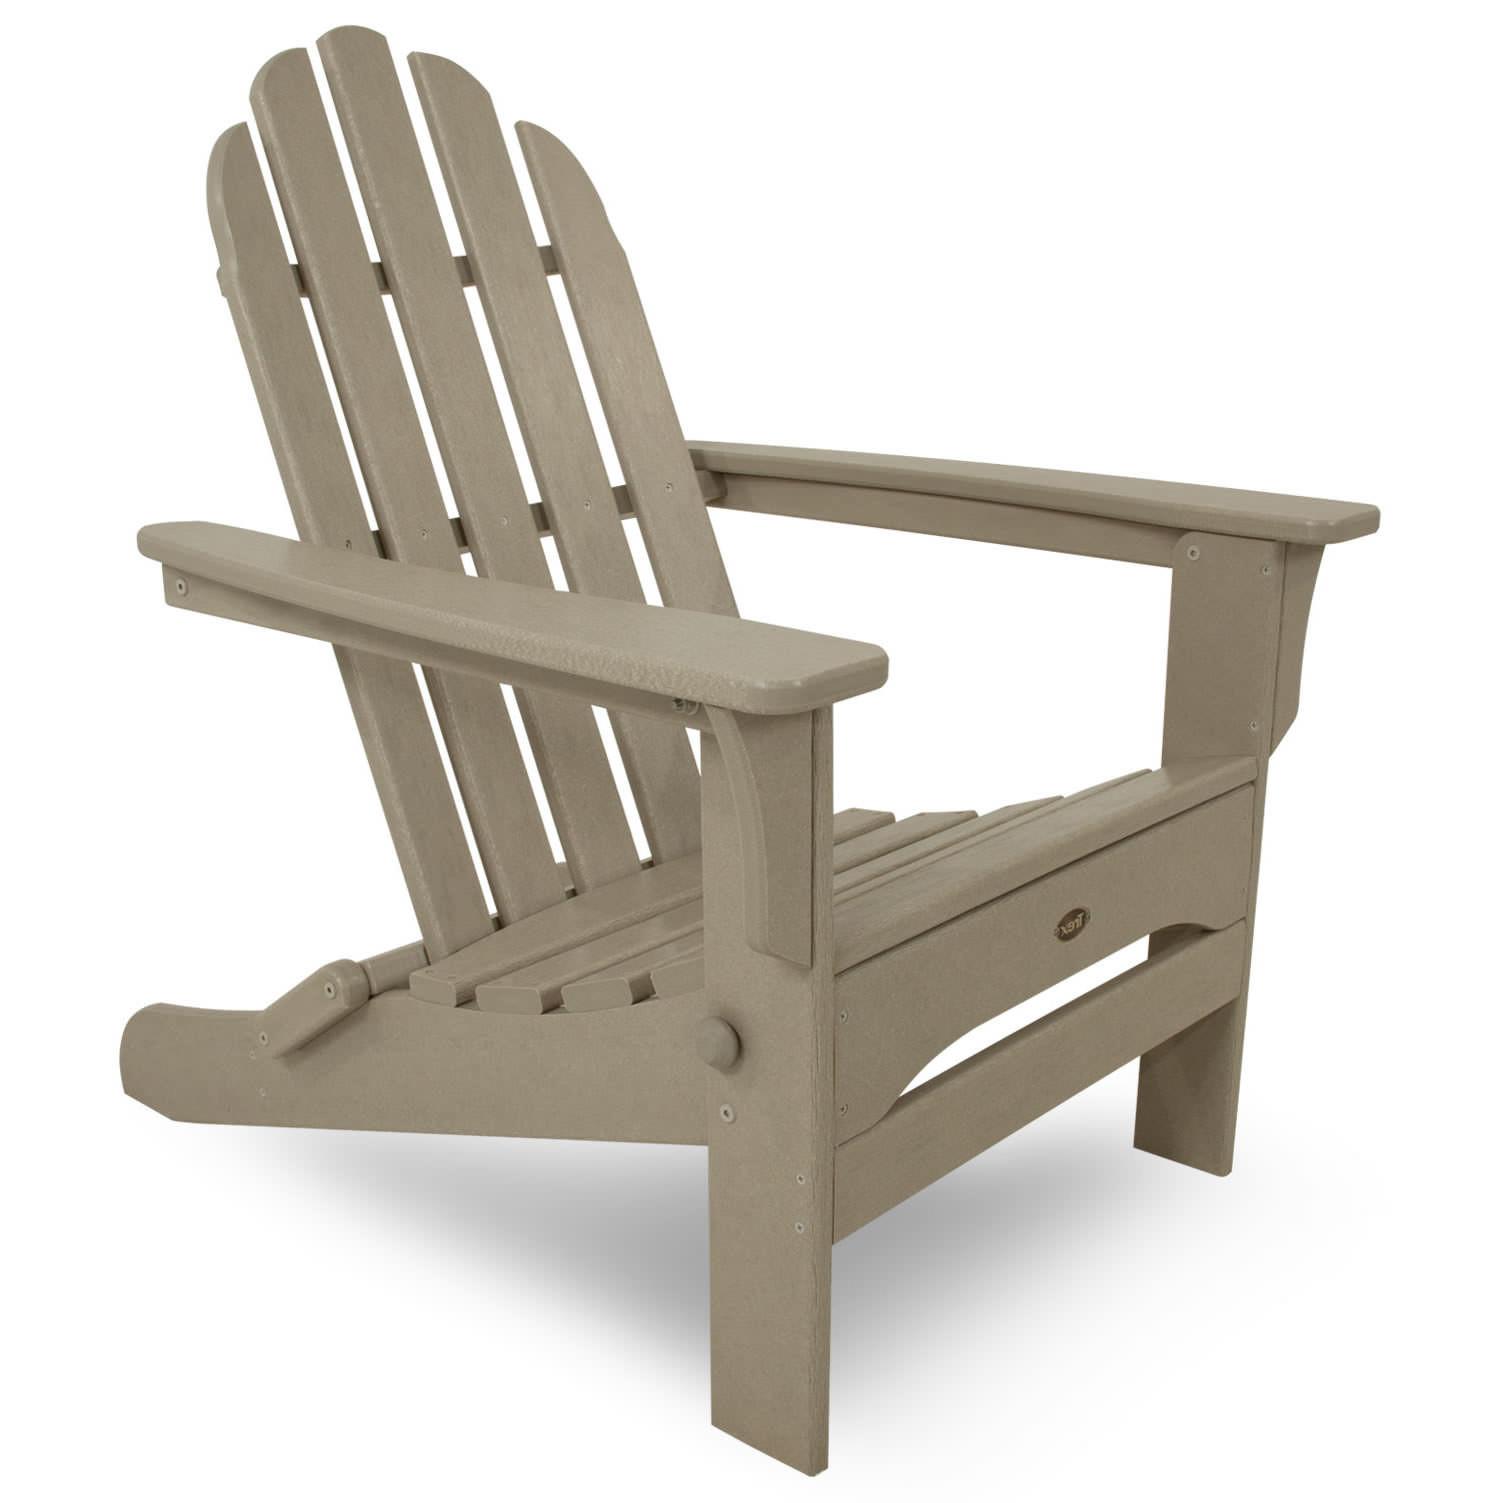 Trex Outdoor Furniture Cape Cod Folding Adirondack Chair Trex